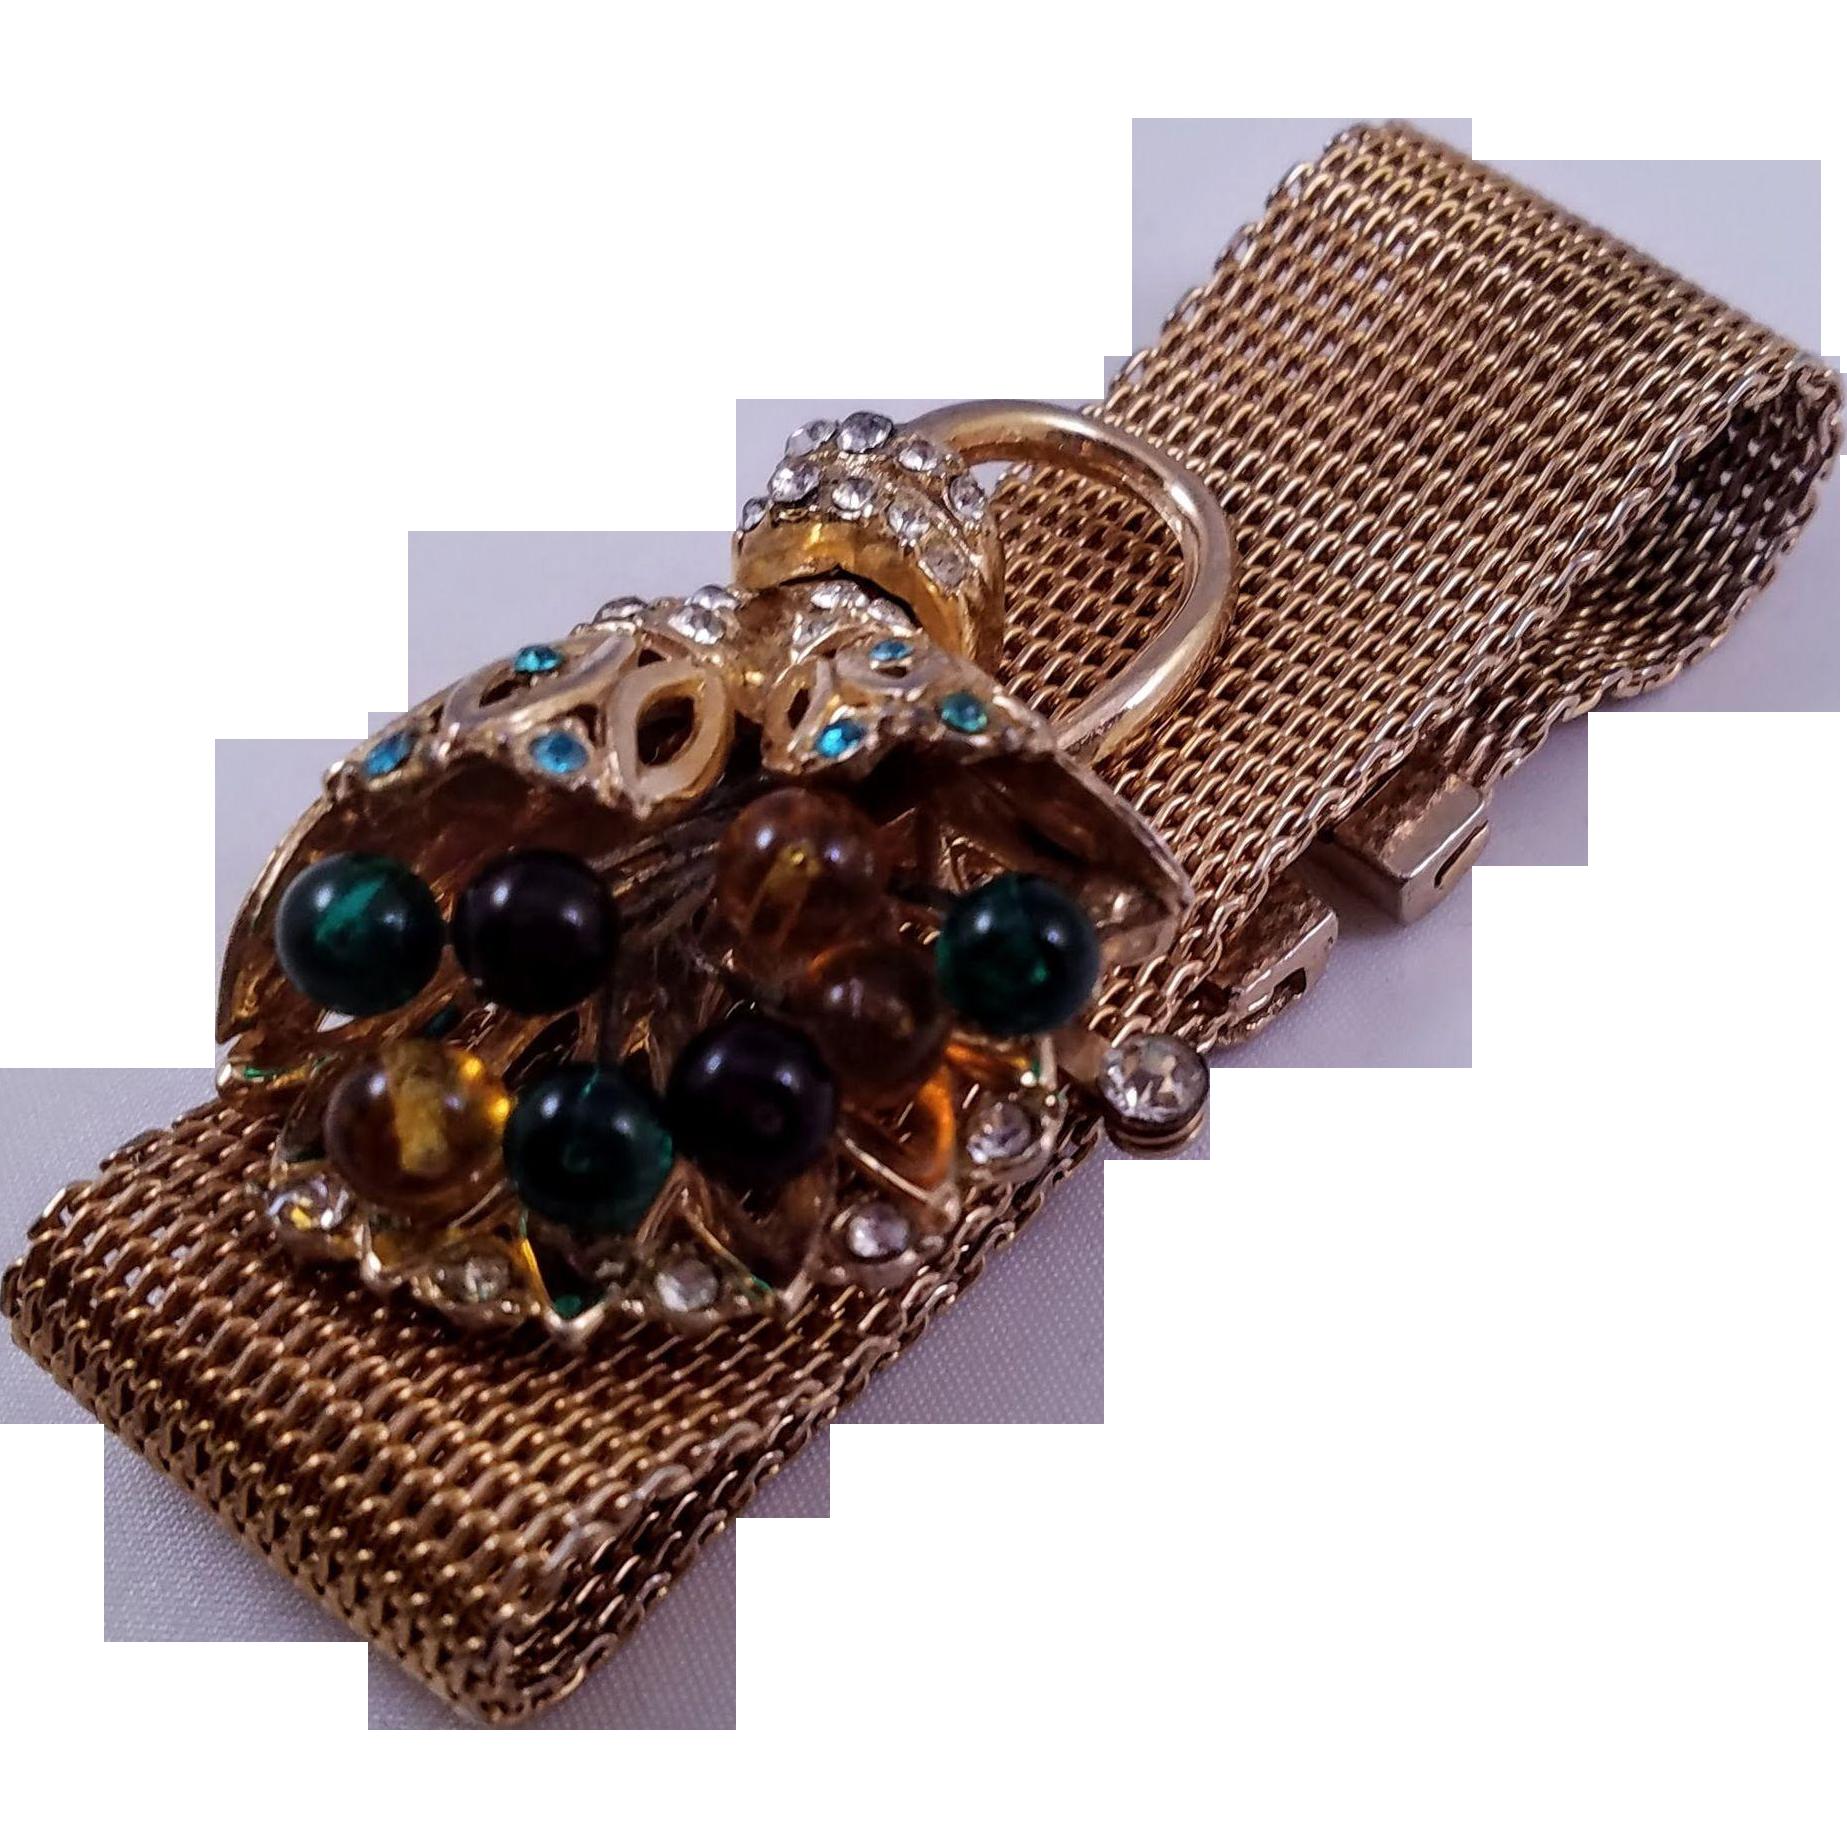 Vintage 1930s Mesh Bracelet with Retro Floral Embellishment